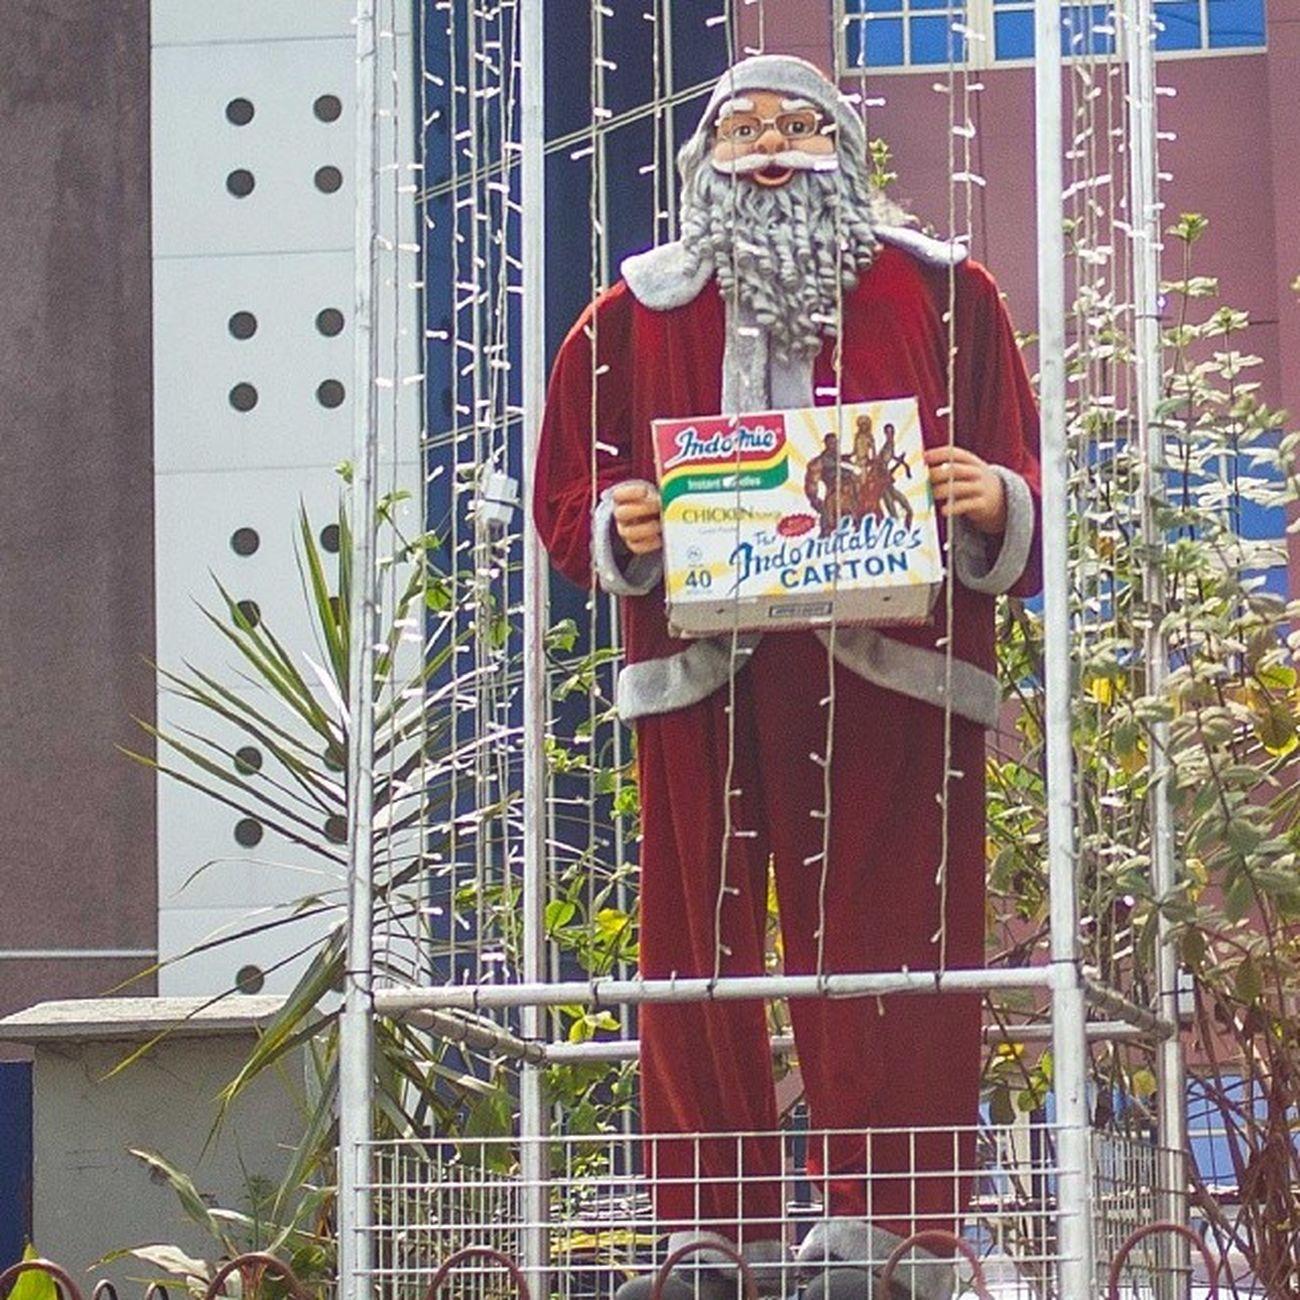 Merry Christmas Nigeria ... ChristmasInLagos Indomie Santa streetphotography Lagos lagosnigeria snapitoga africa